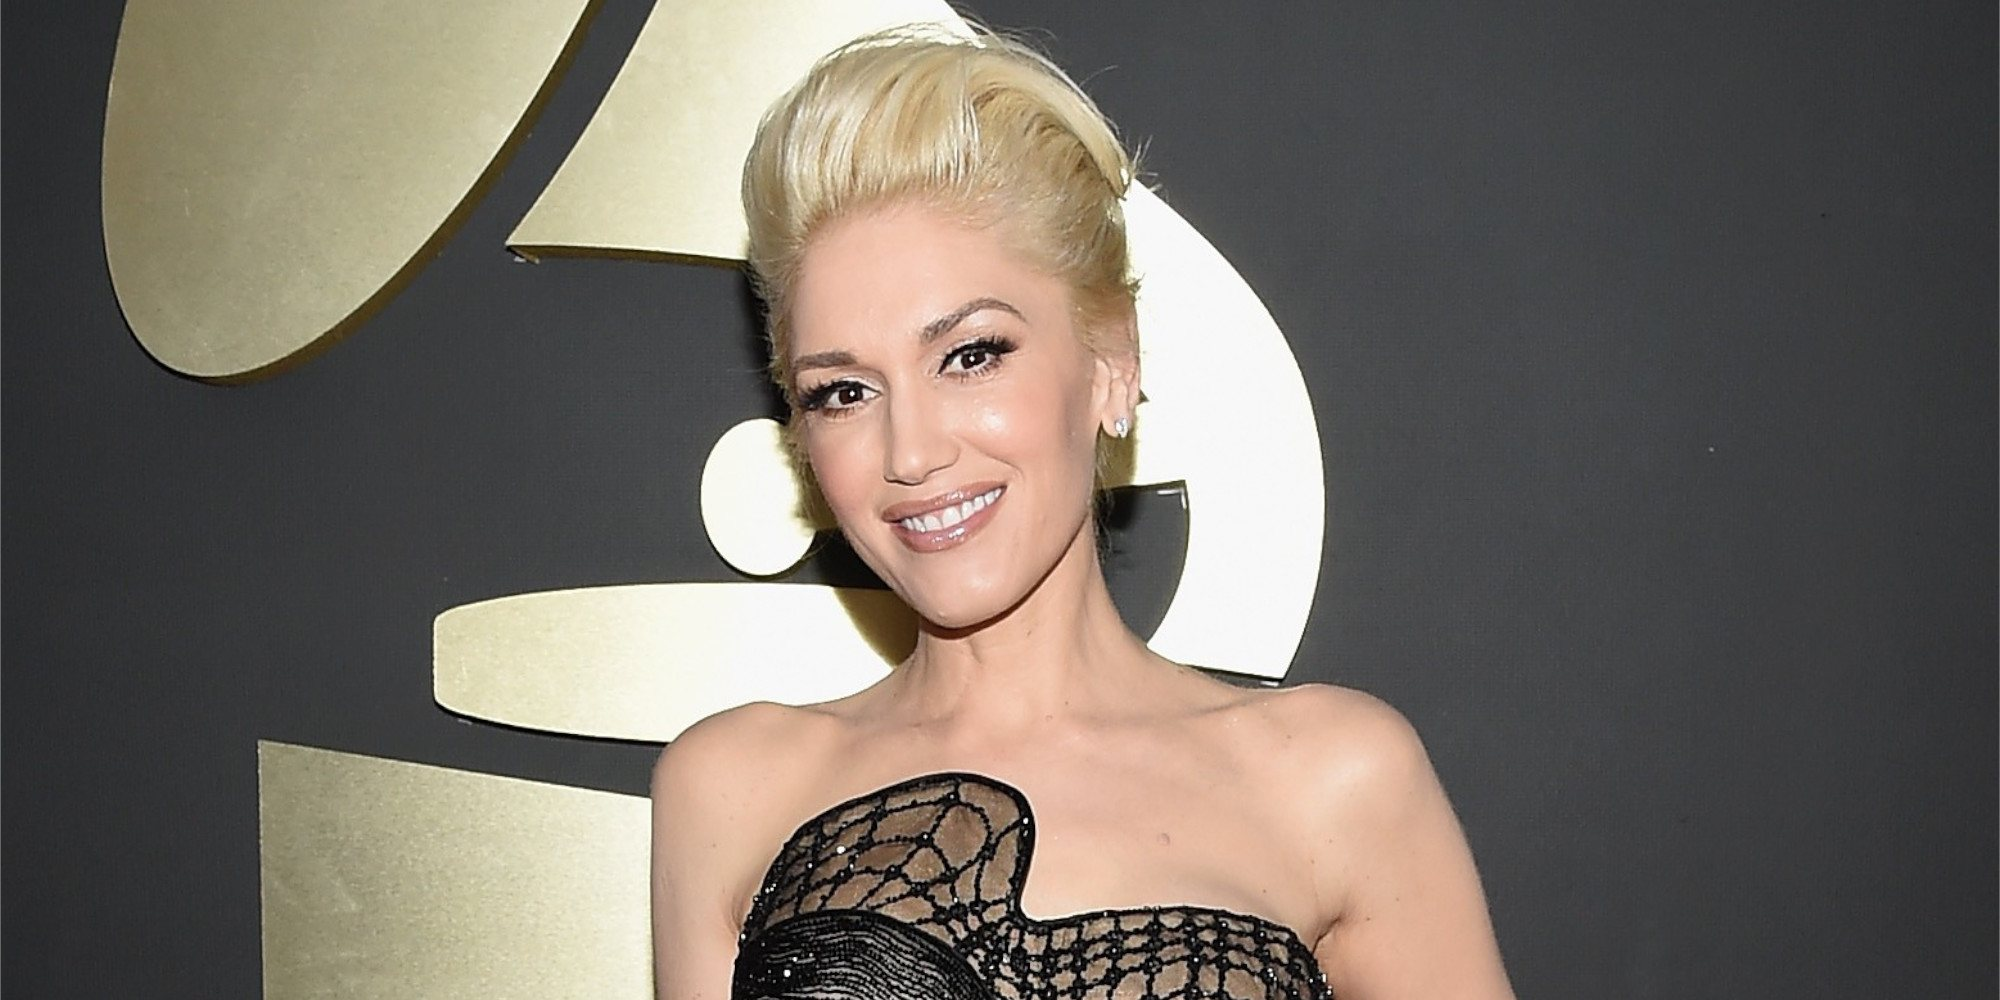 Todo lo que debes saber sobre Gwen Stefani, la cantante que nos conquistó con 'No Doubt'